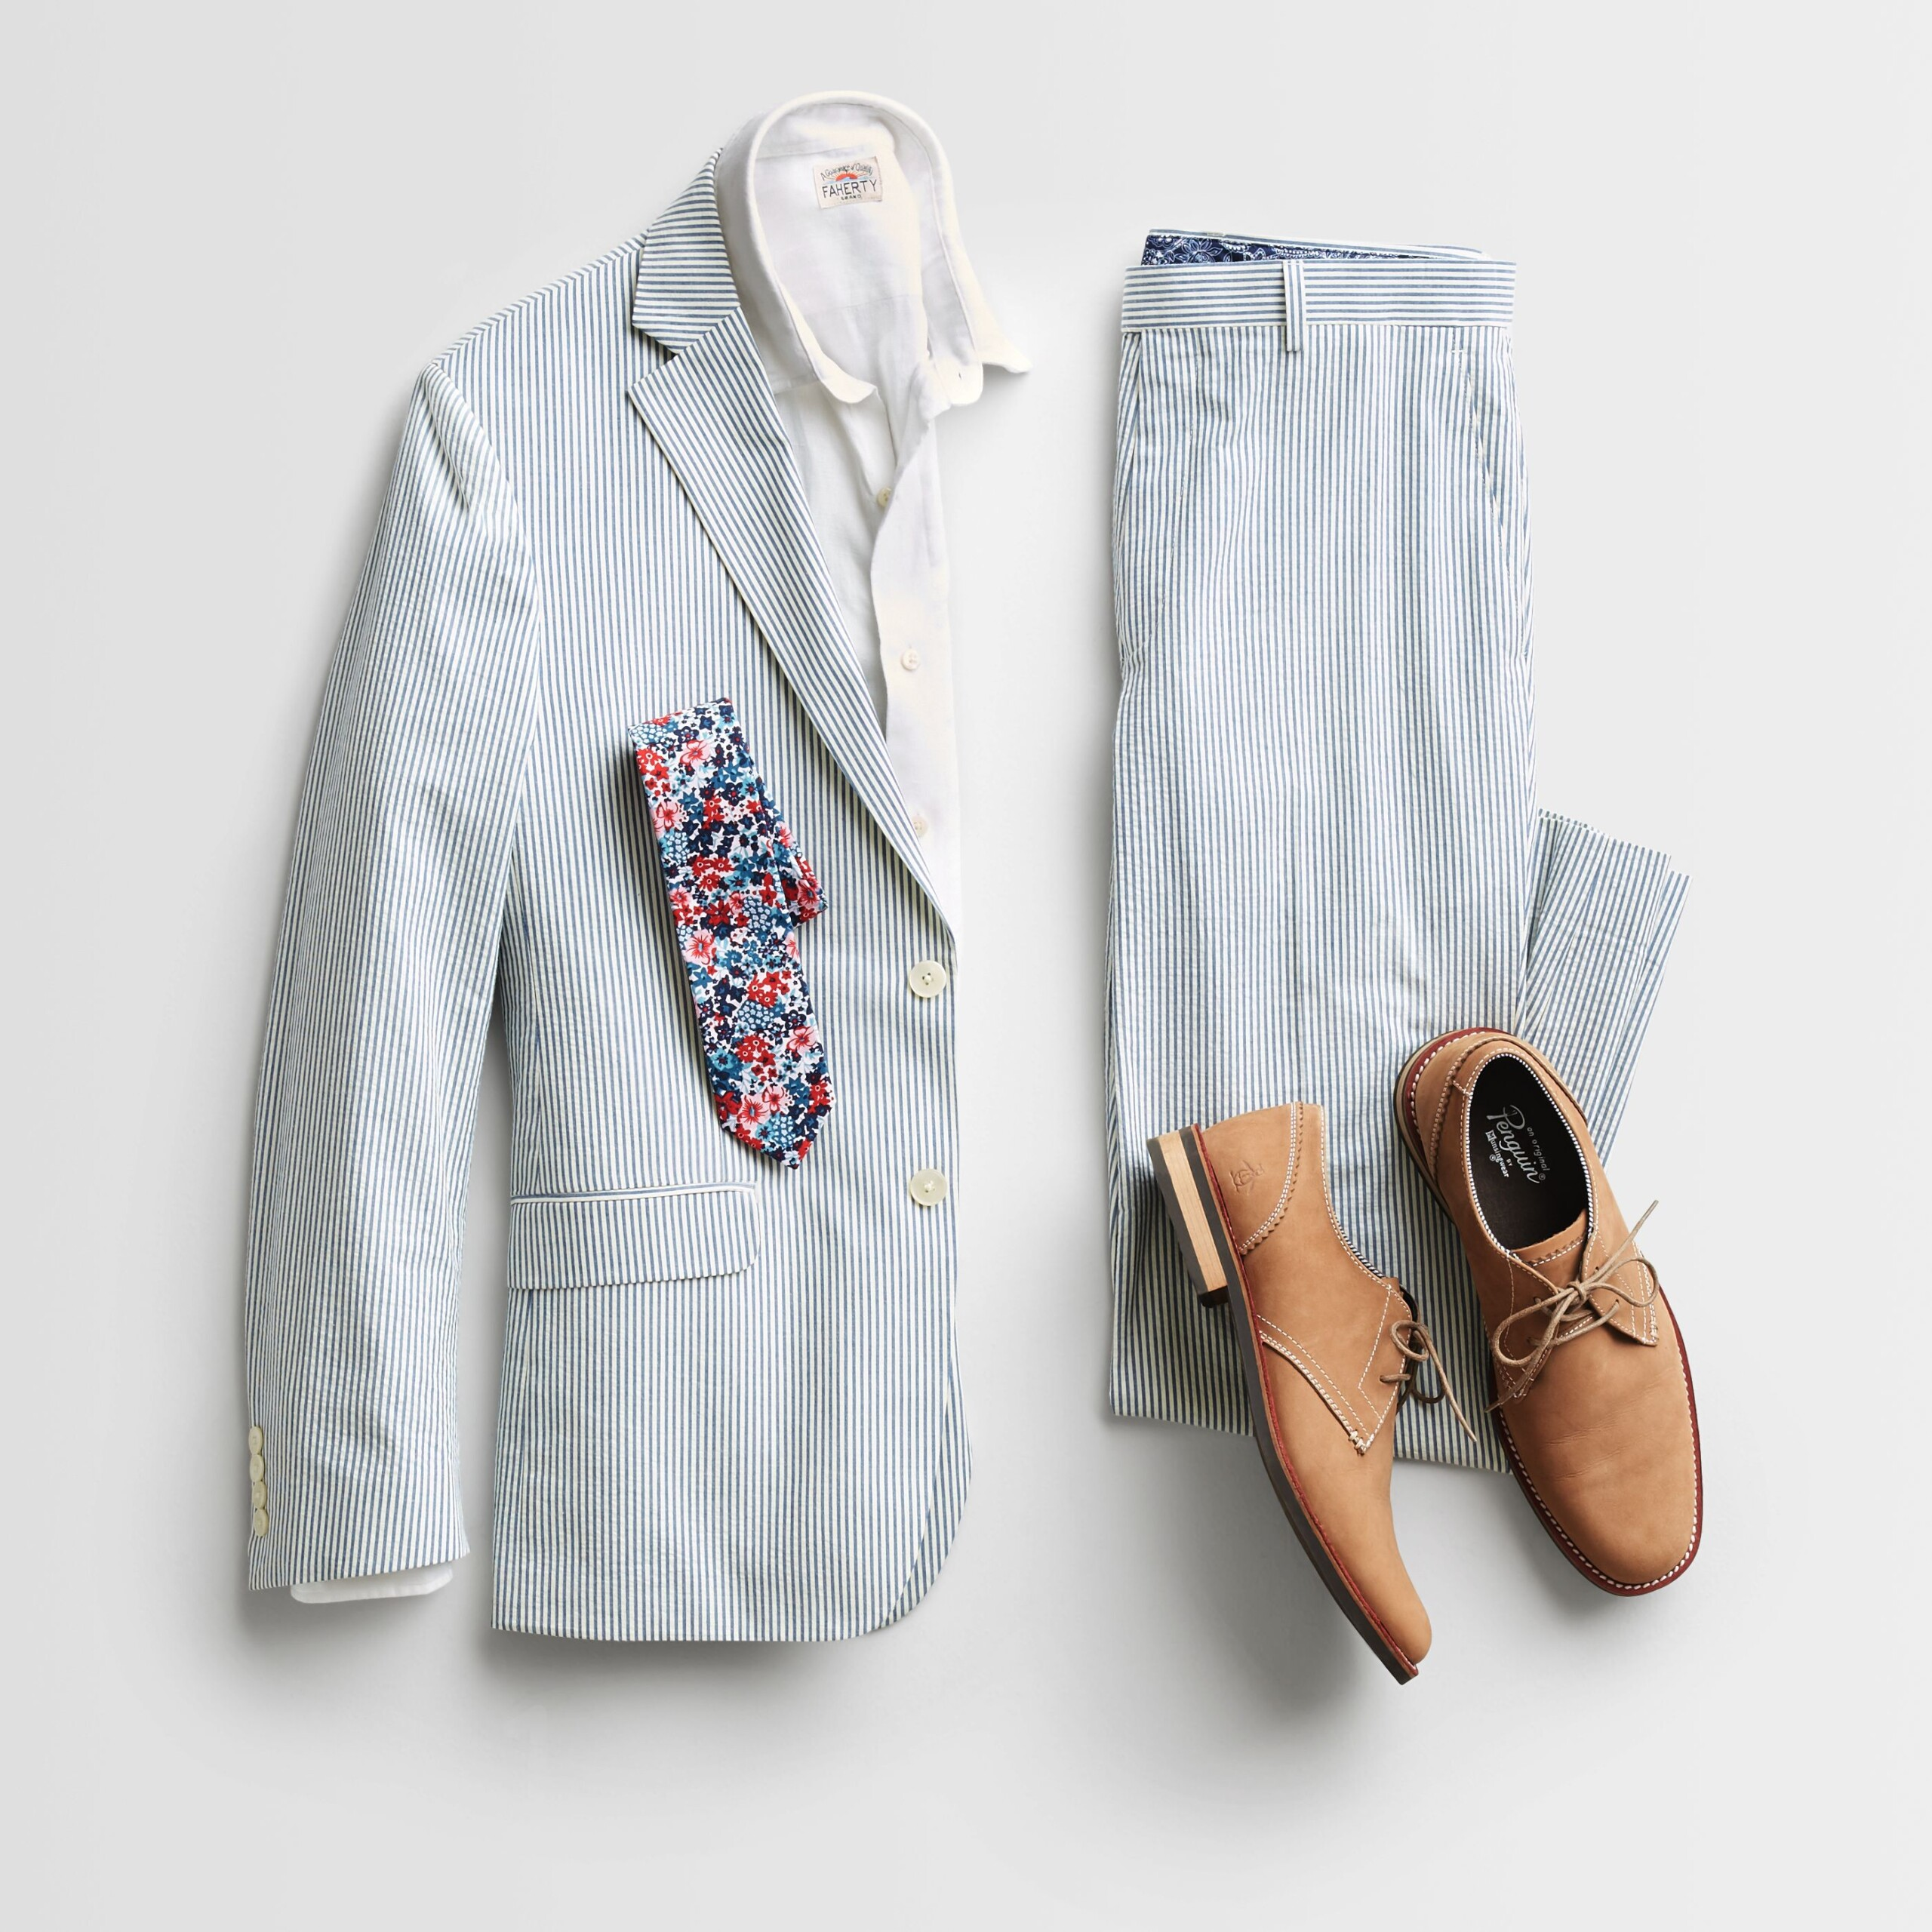 Stitch Fix Men's microfloral tie accessorizes a seersucker suit, white button-down dress shirt.